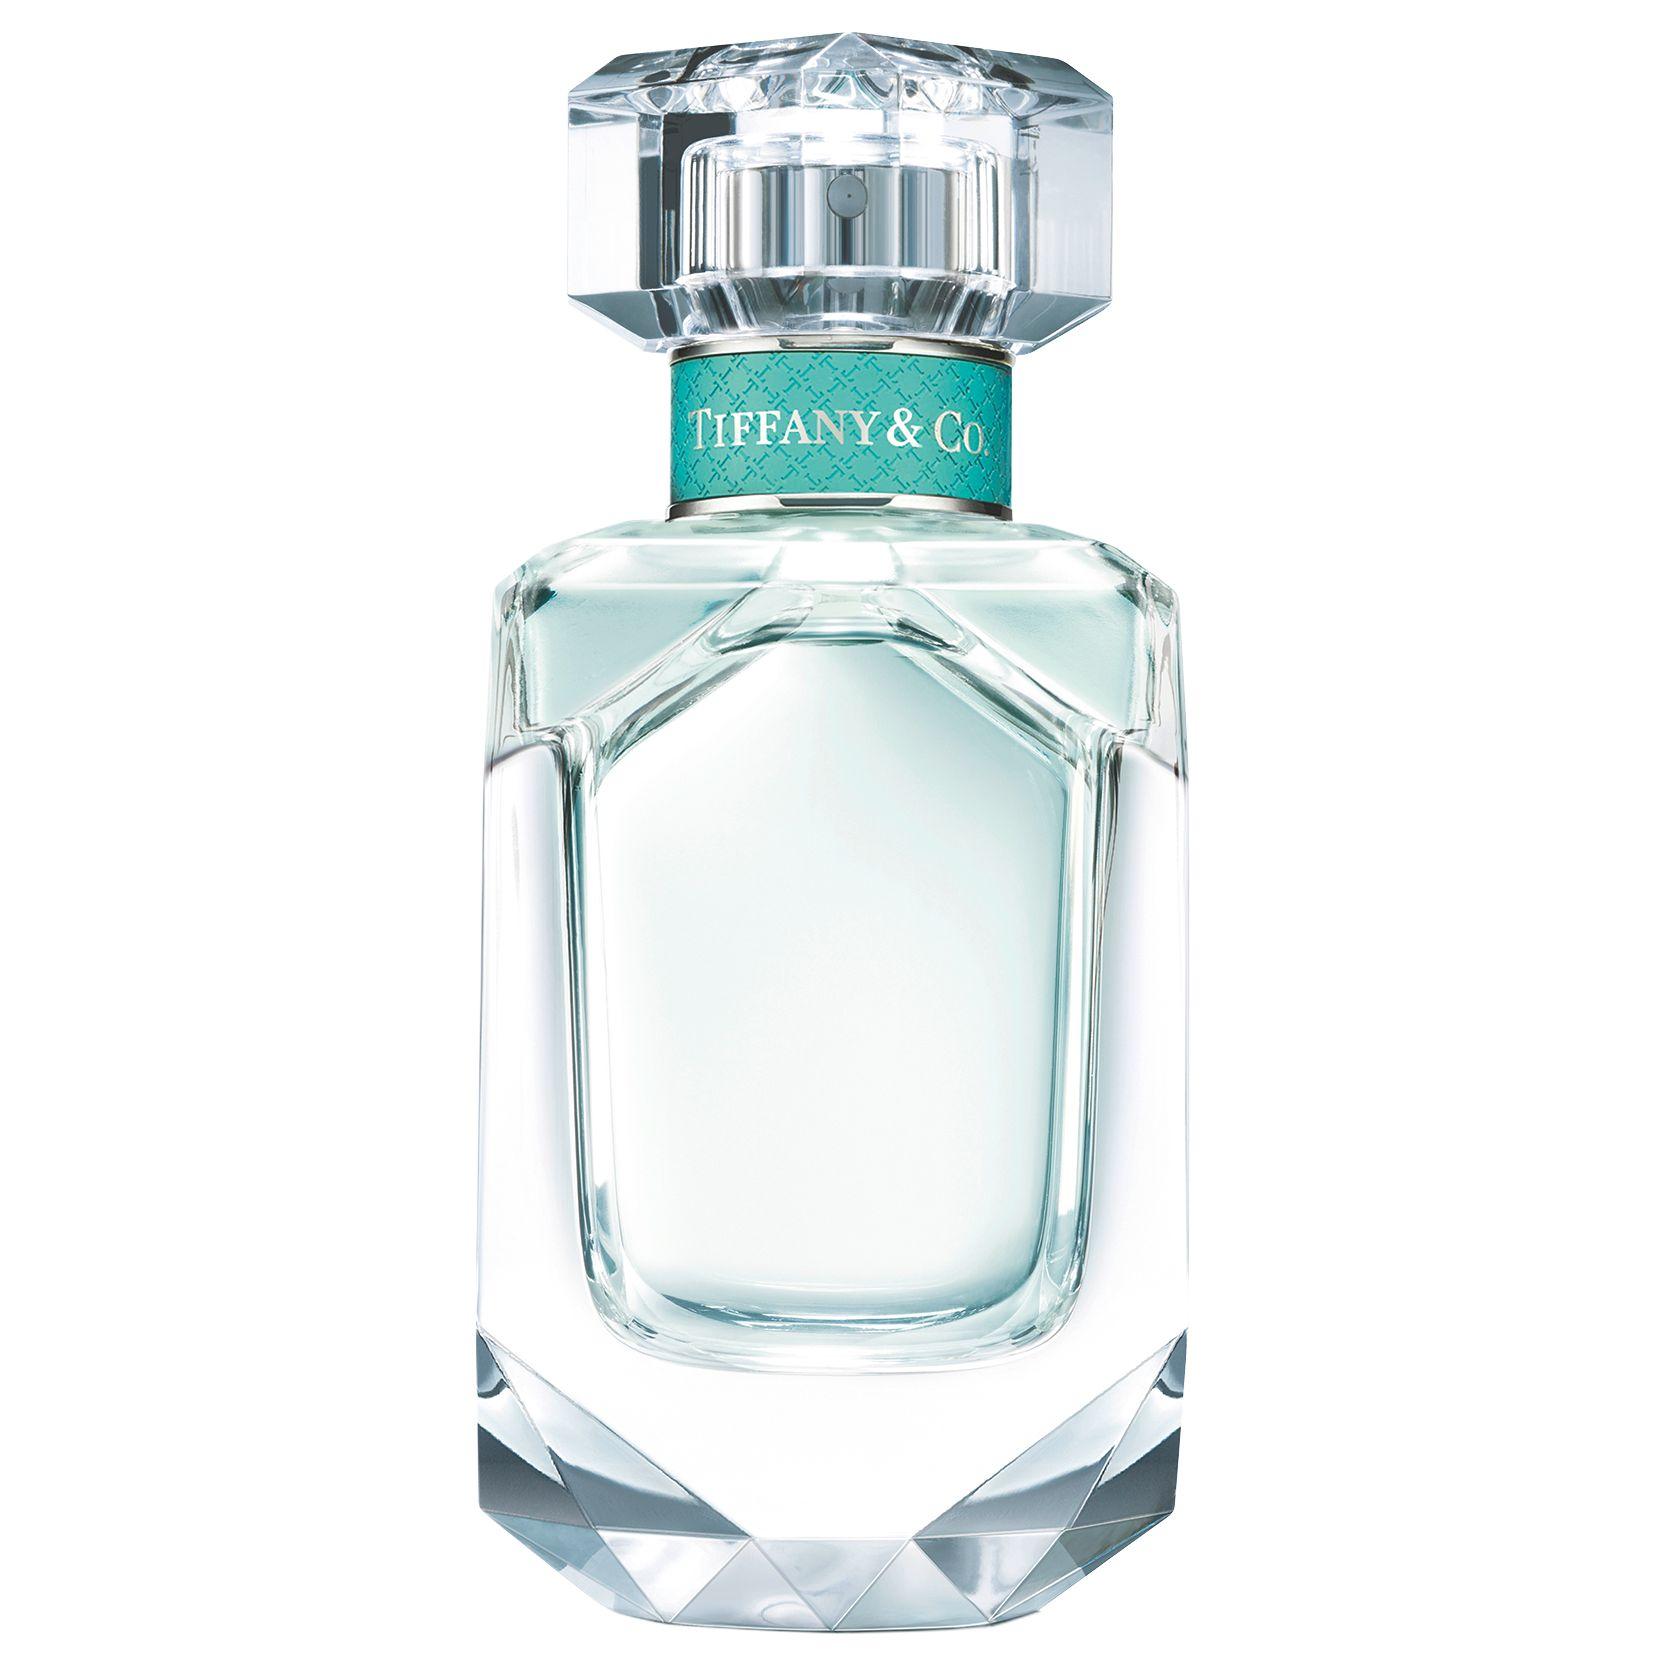 Tiffany & Co Tiffany & Co Eau de Parfum